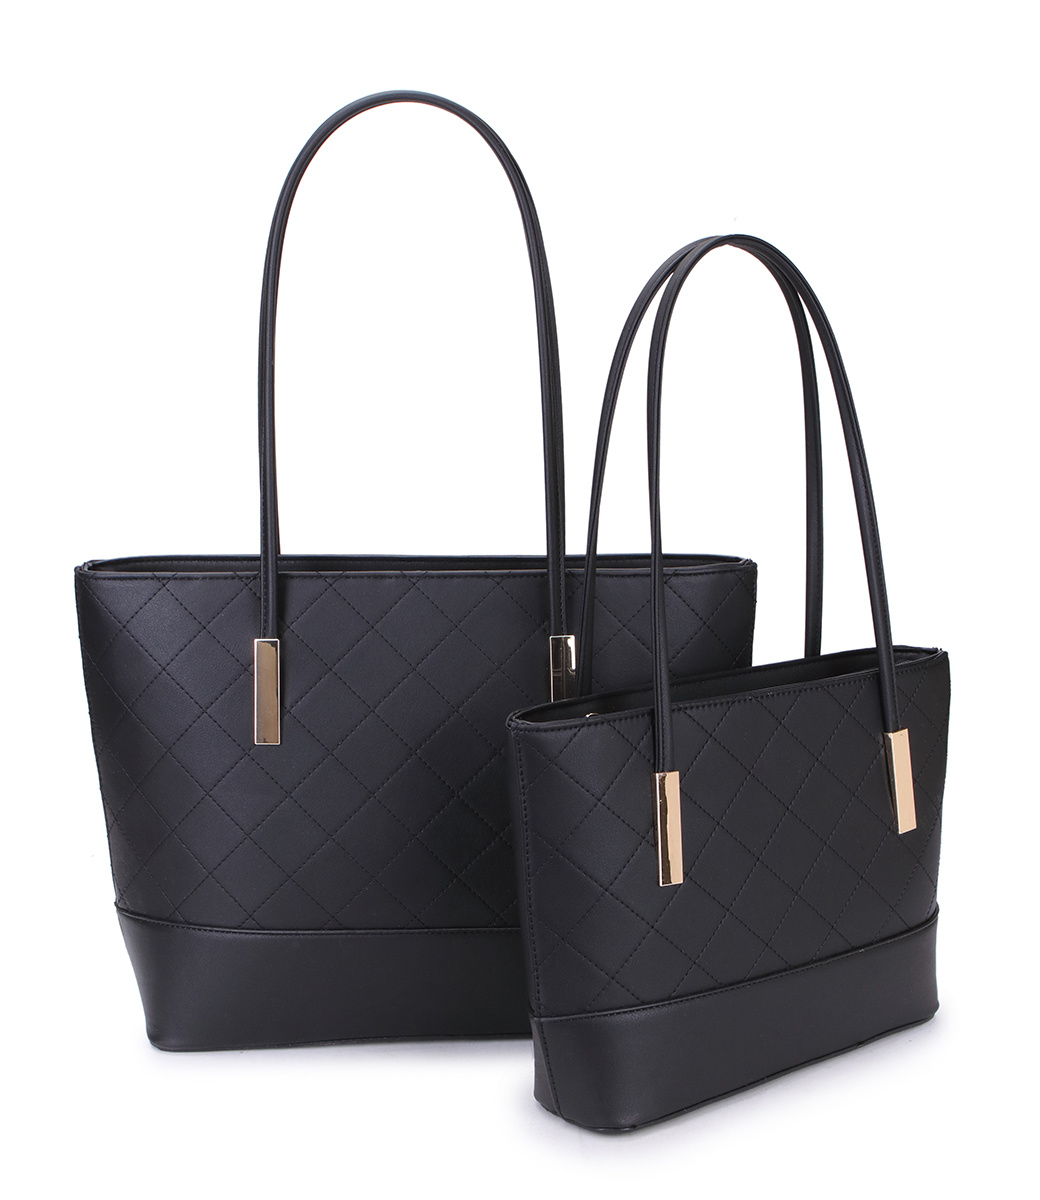 Amanda shopper set